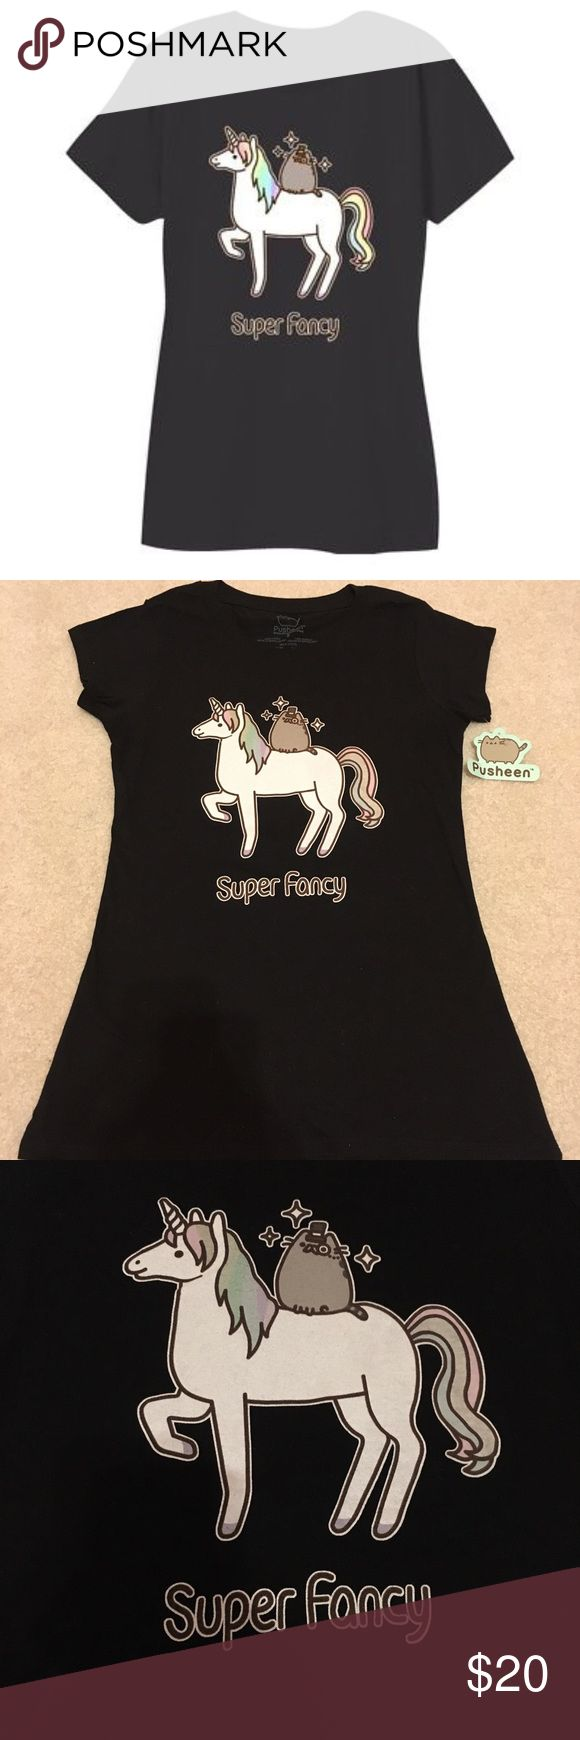 Pusheen Super Fancy Tee NWT authentic Pusheen shirt  Cute pusheen shirt with Pusheen riding a unicorn!  100% cotton  Shirt is too small for me, looking to sell.  Size small Pusheen Tops Tees - Short Sleeve